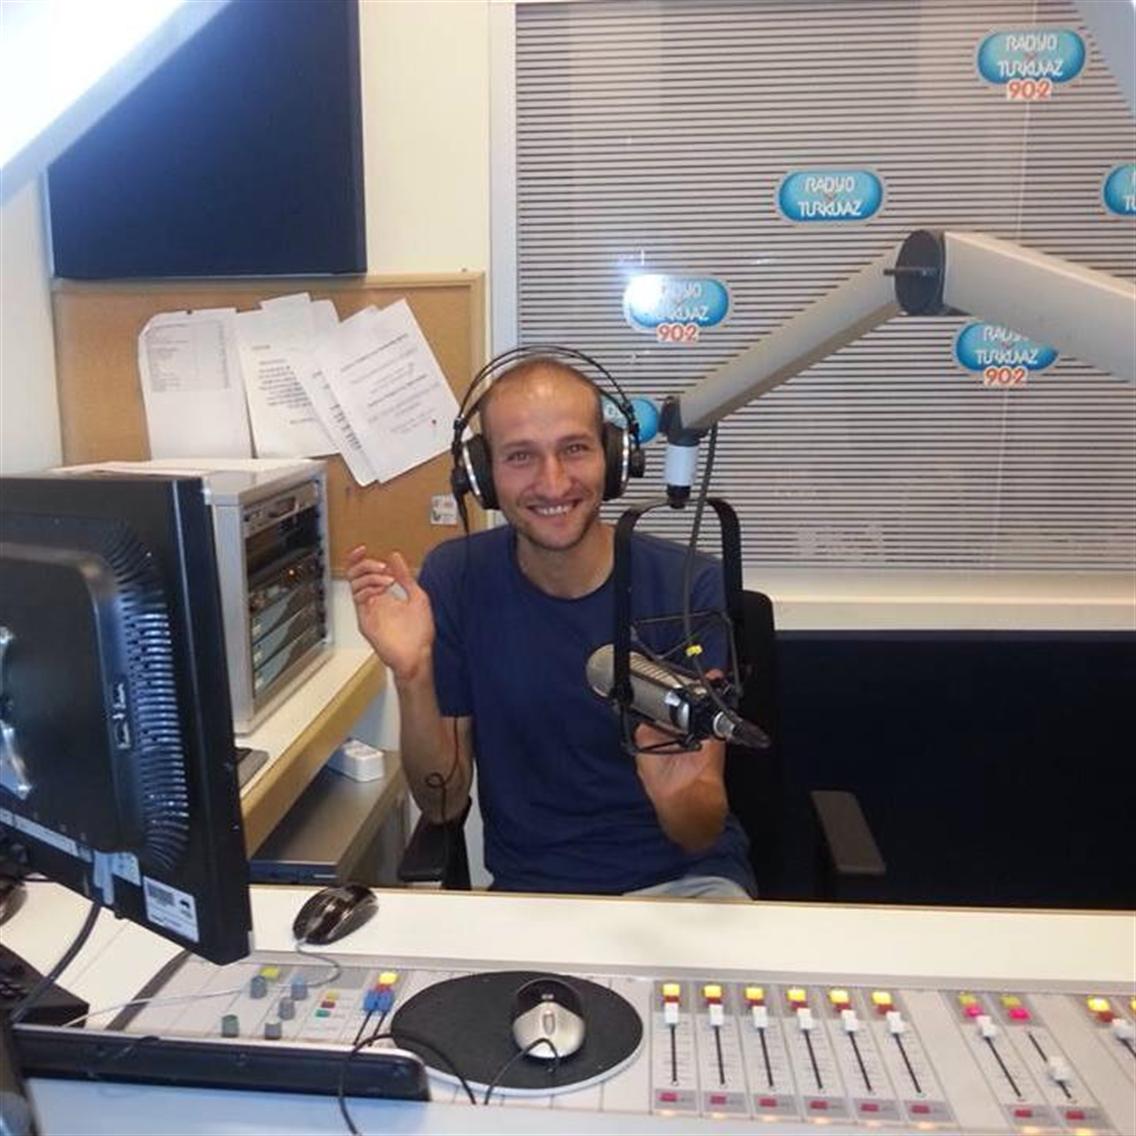 Radyo Master